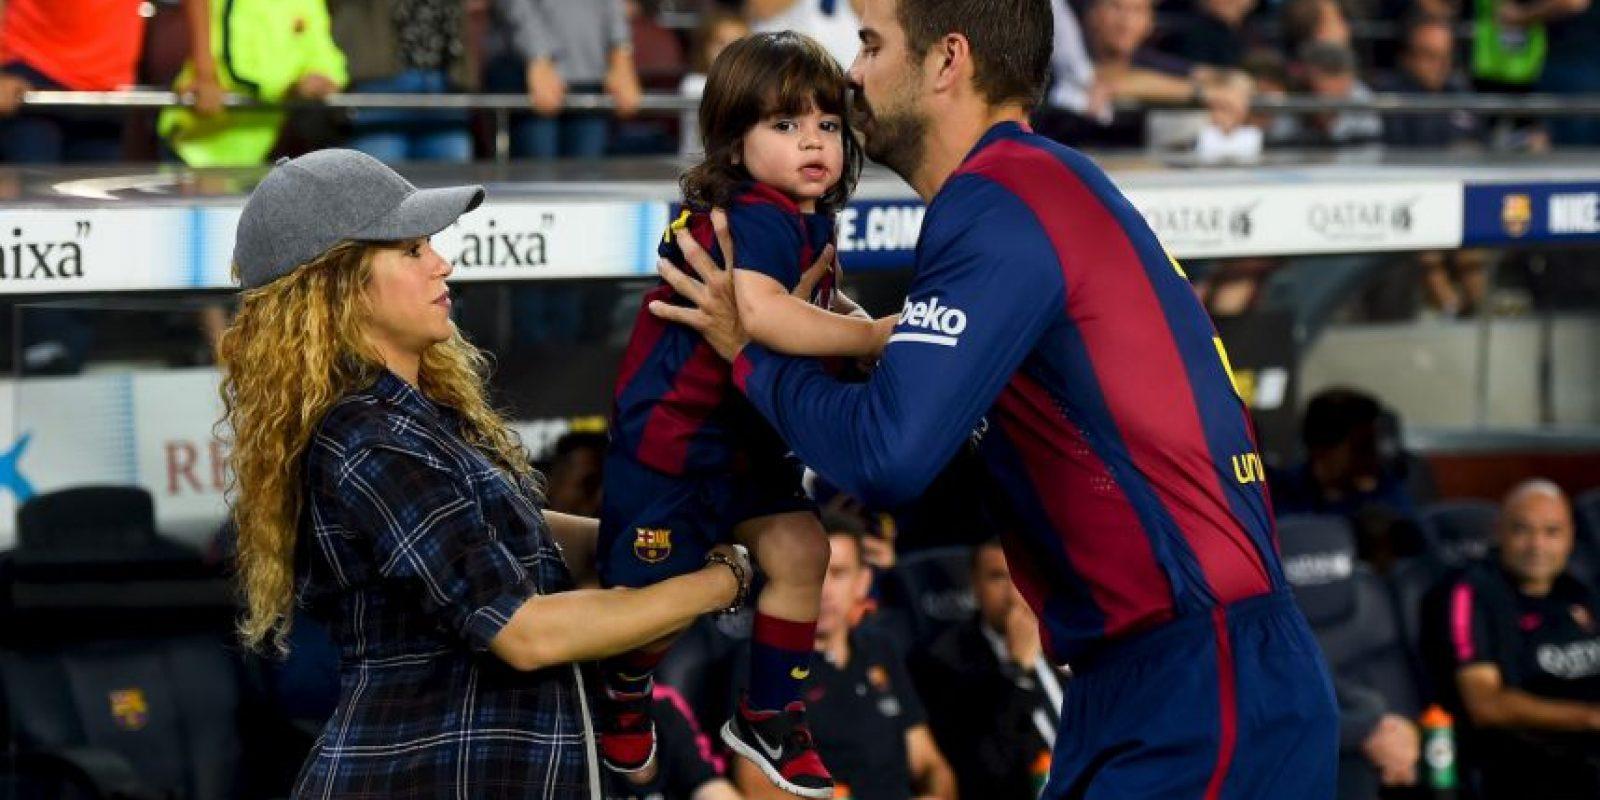 Es pareja de la cantante colombiana Shakira. Foto:Getty Images